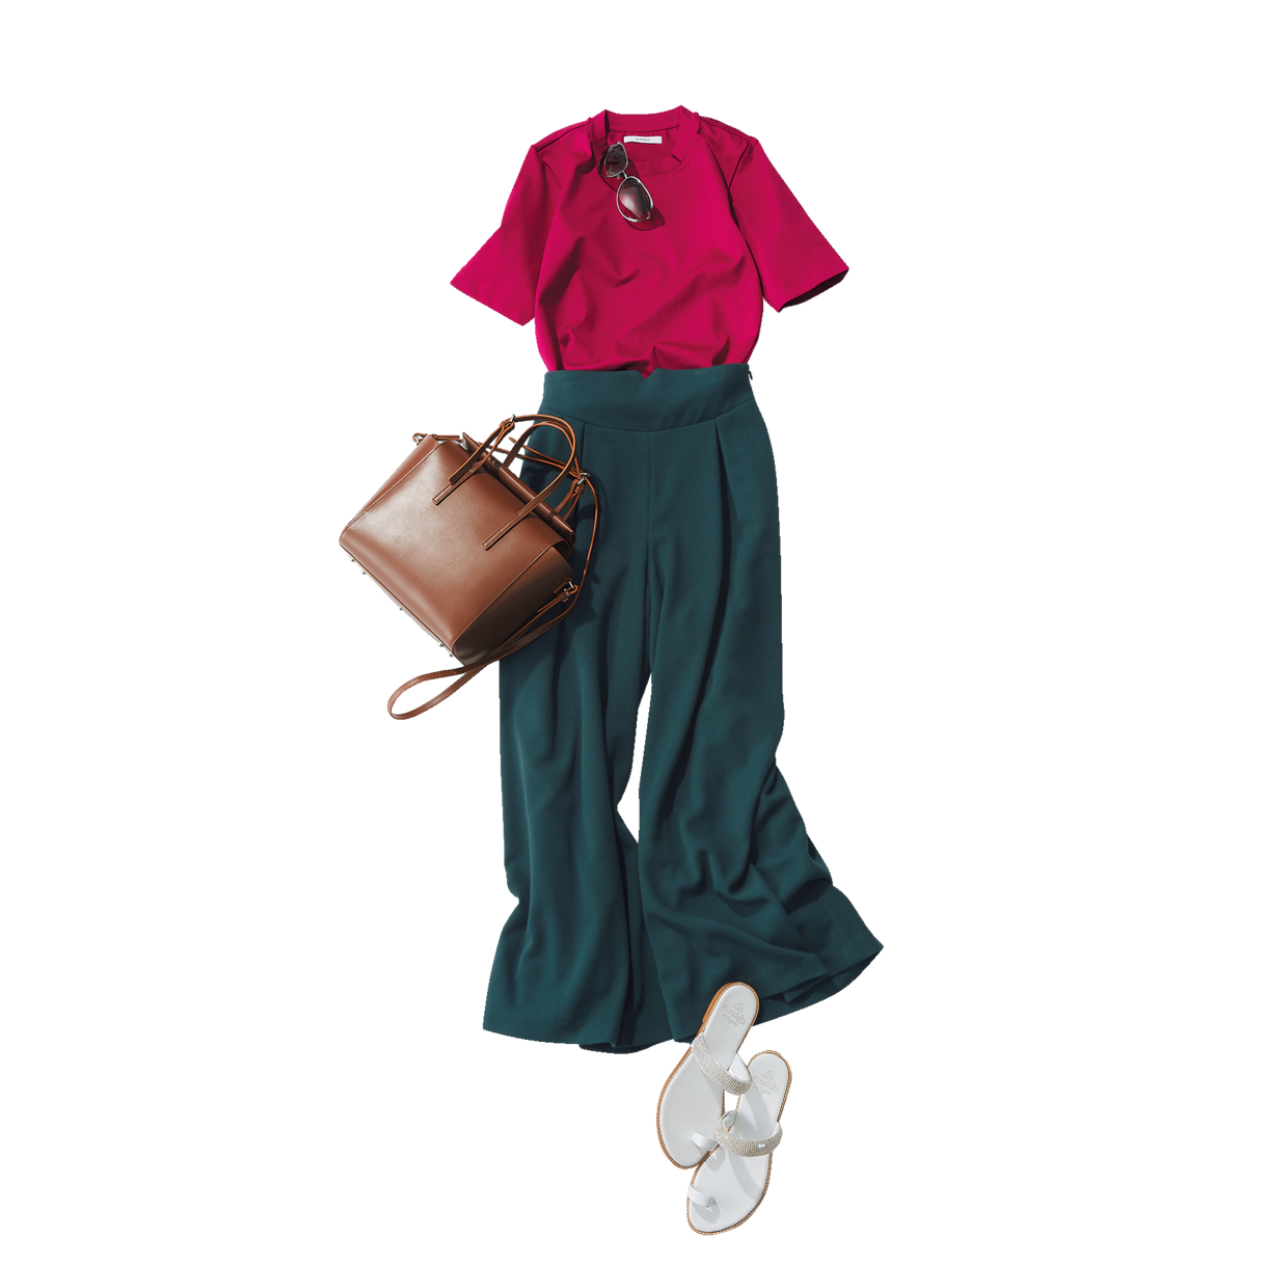 Tシャツ×グリーンのワイドパンツコーデ